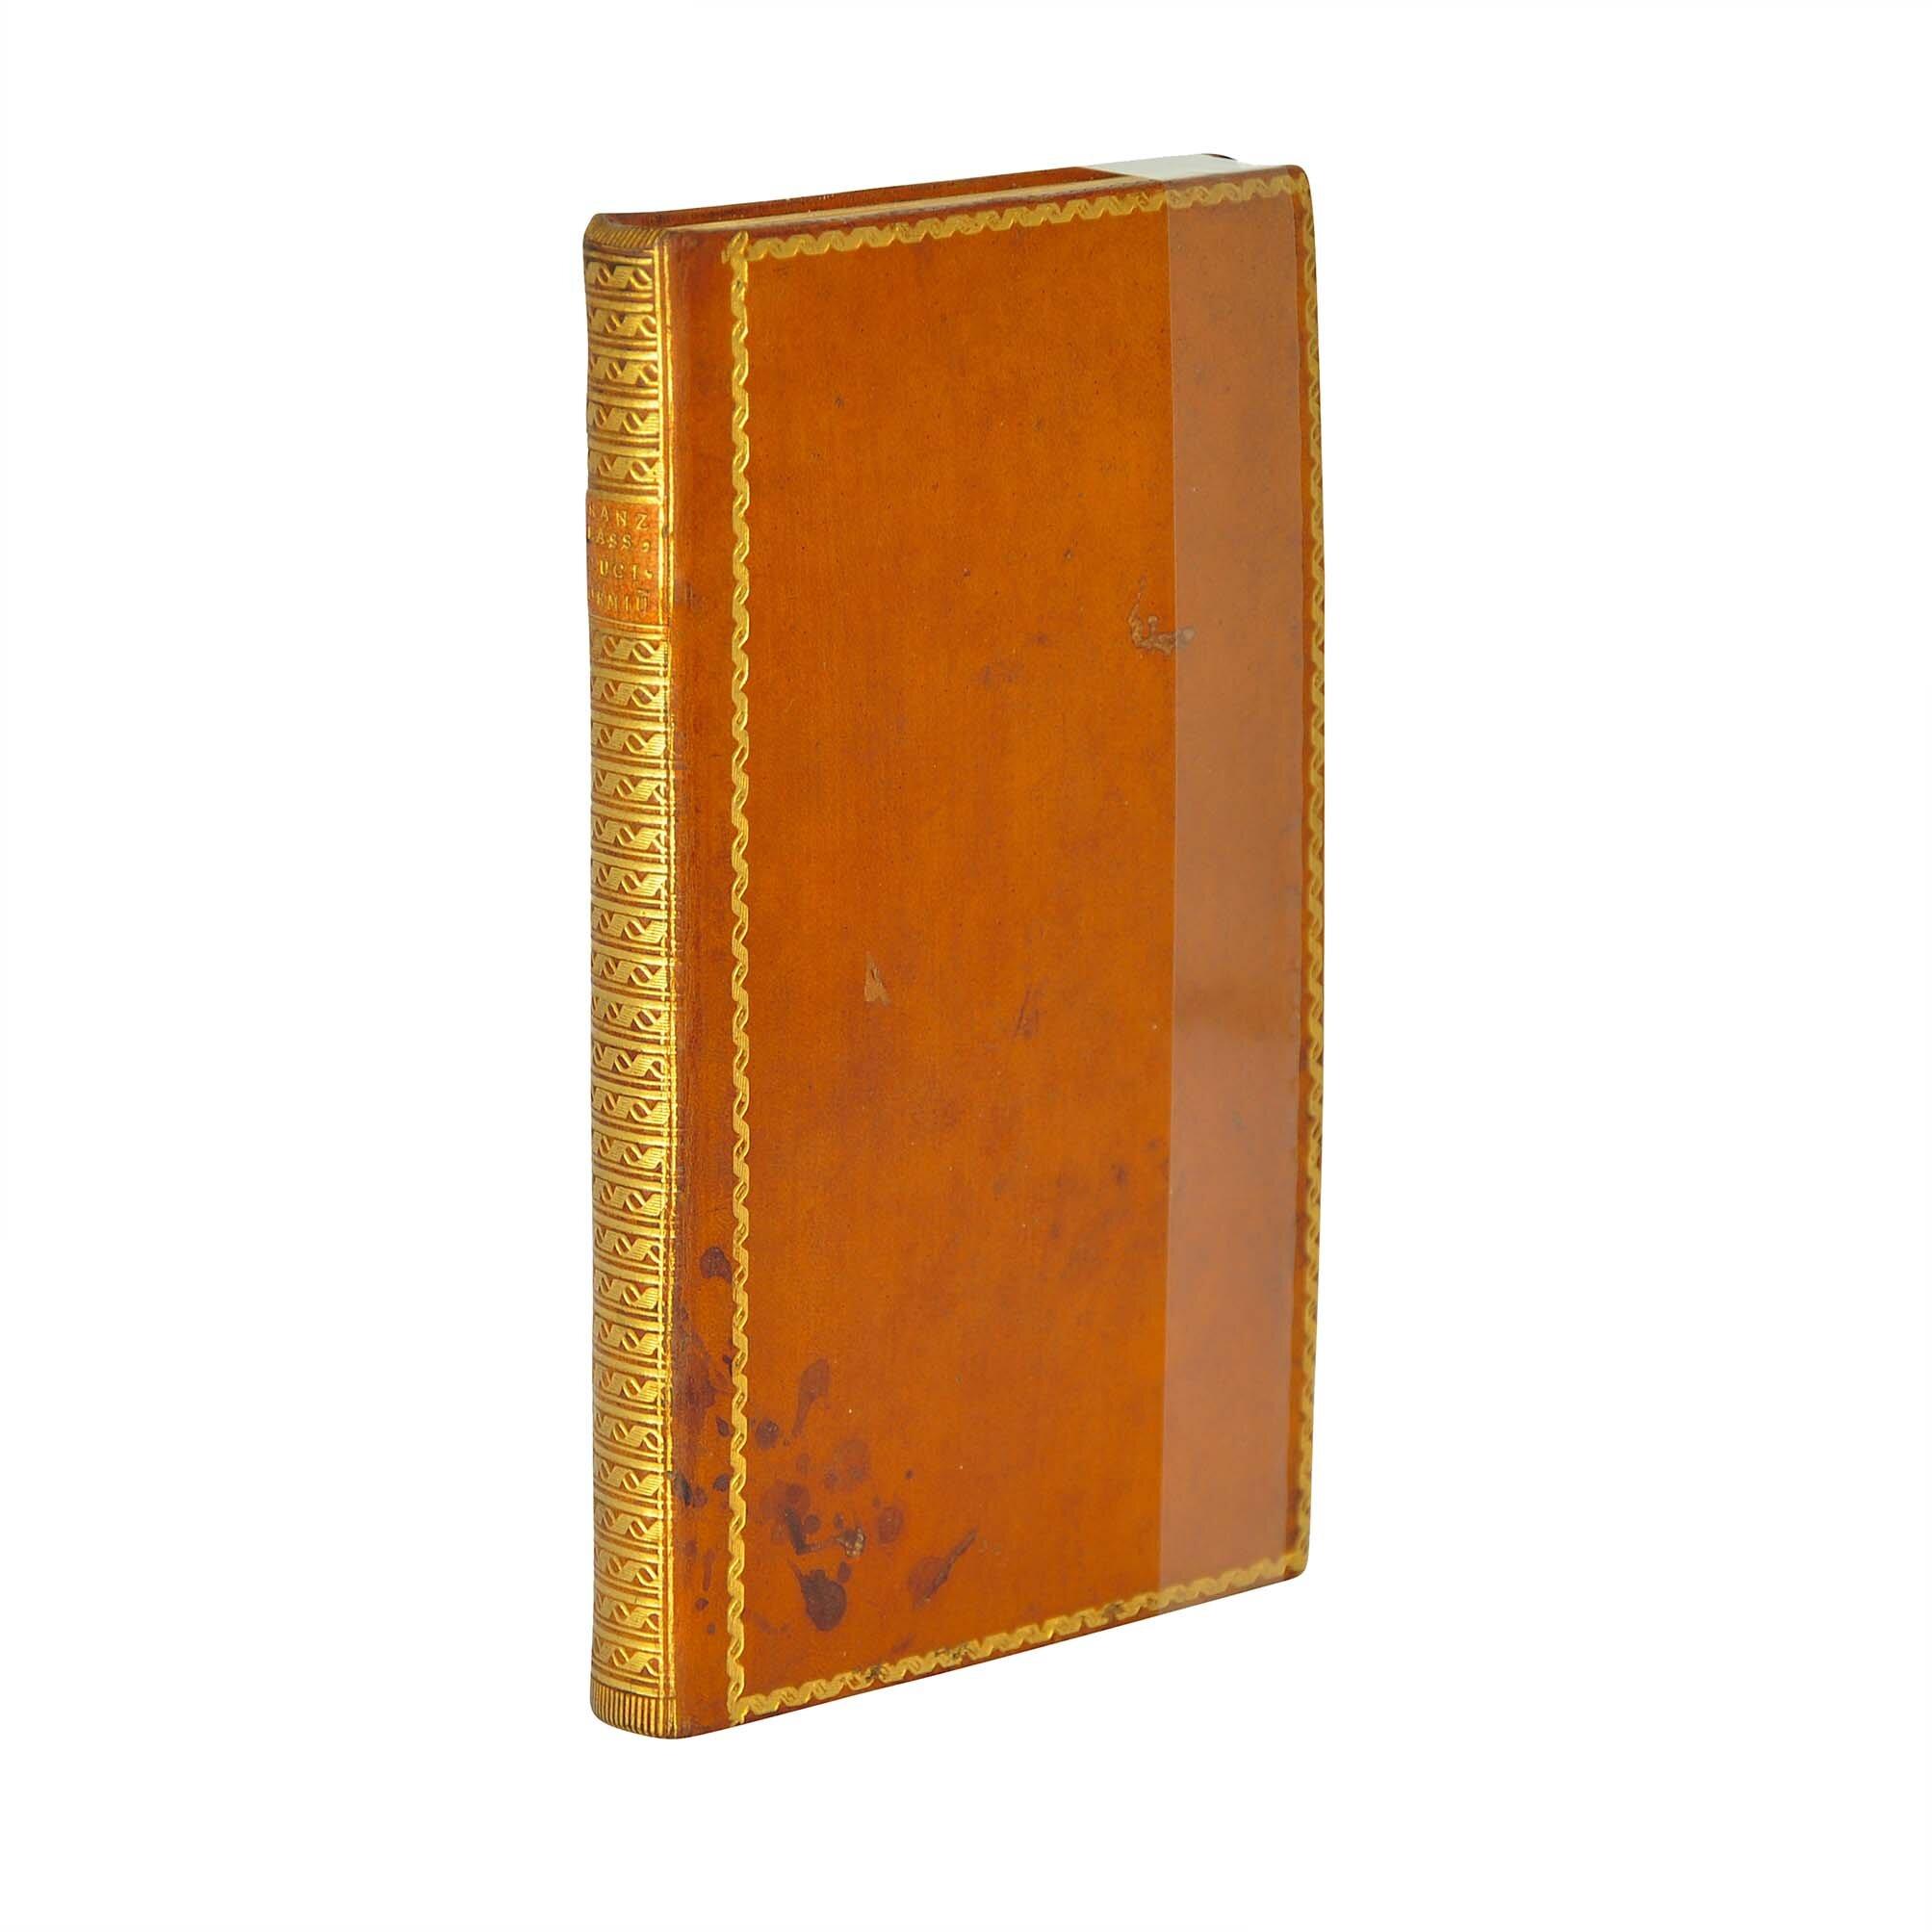 5621 Crantz Classis cruciformium 1769 Cover free A N